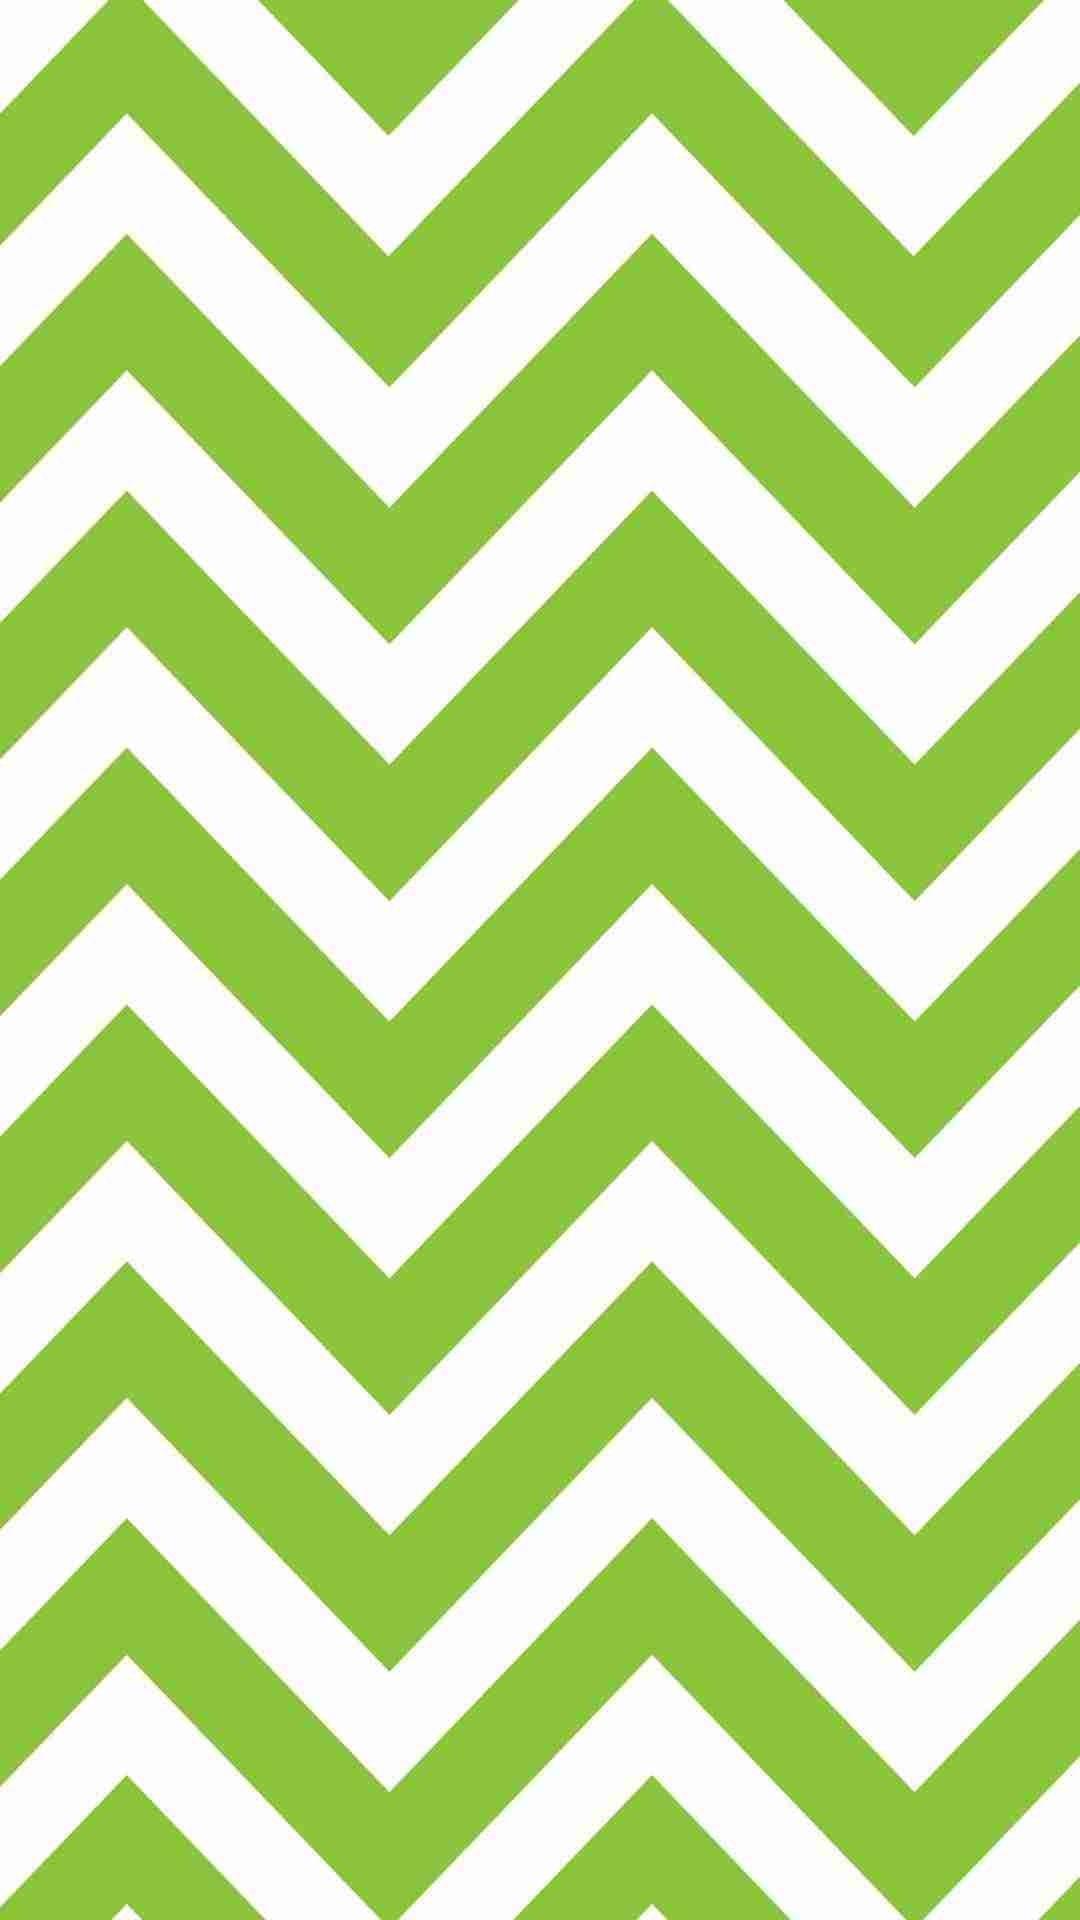 Light Green Chevron iPhone 6 Plus Wallpaper – White Zigzag Pattern, Ze  Print #iPhone